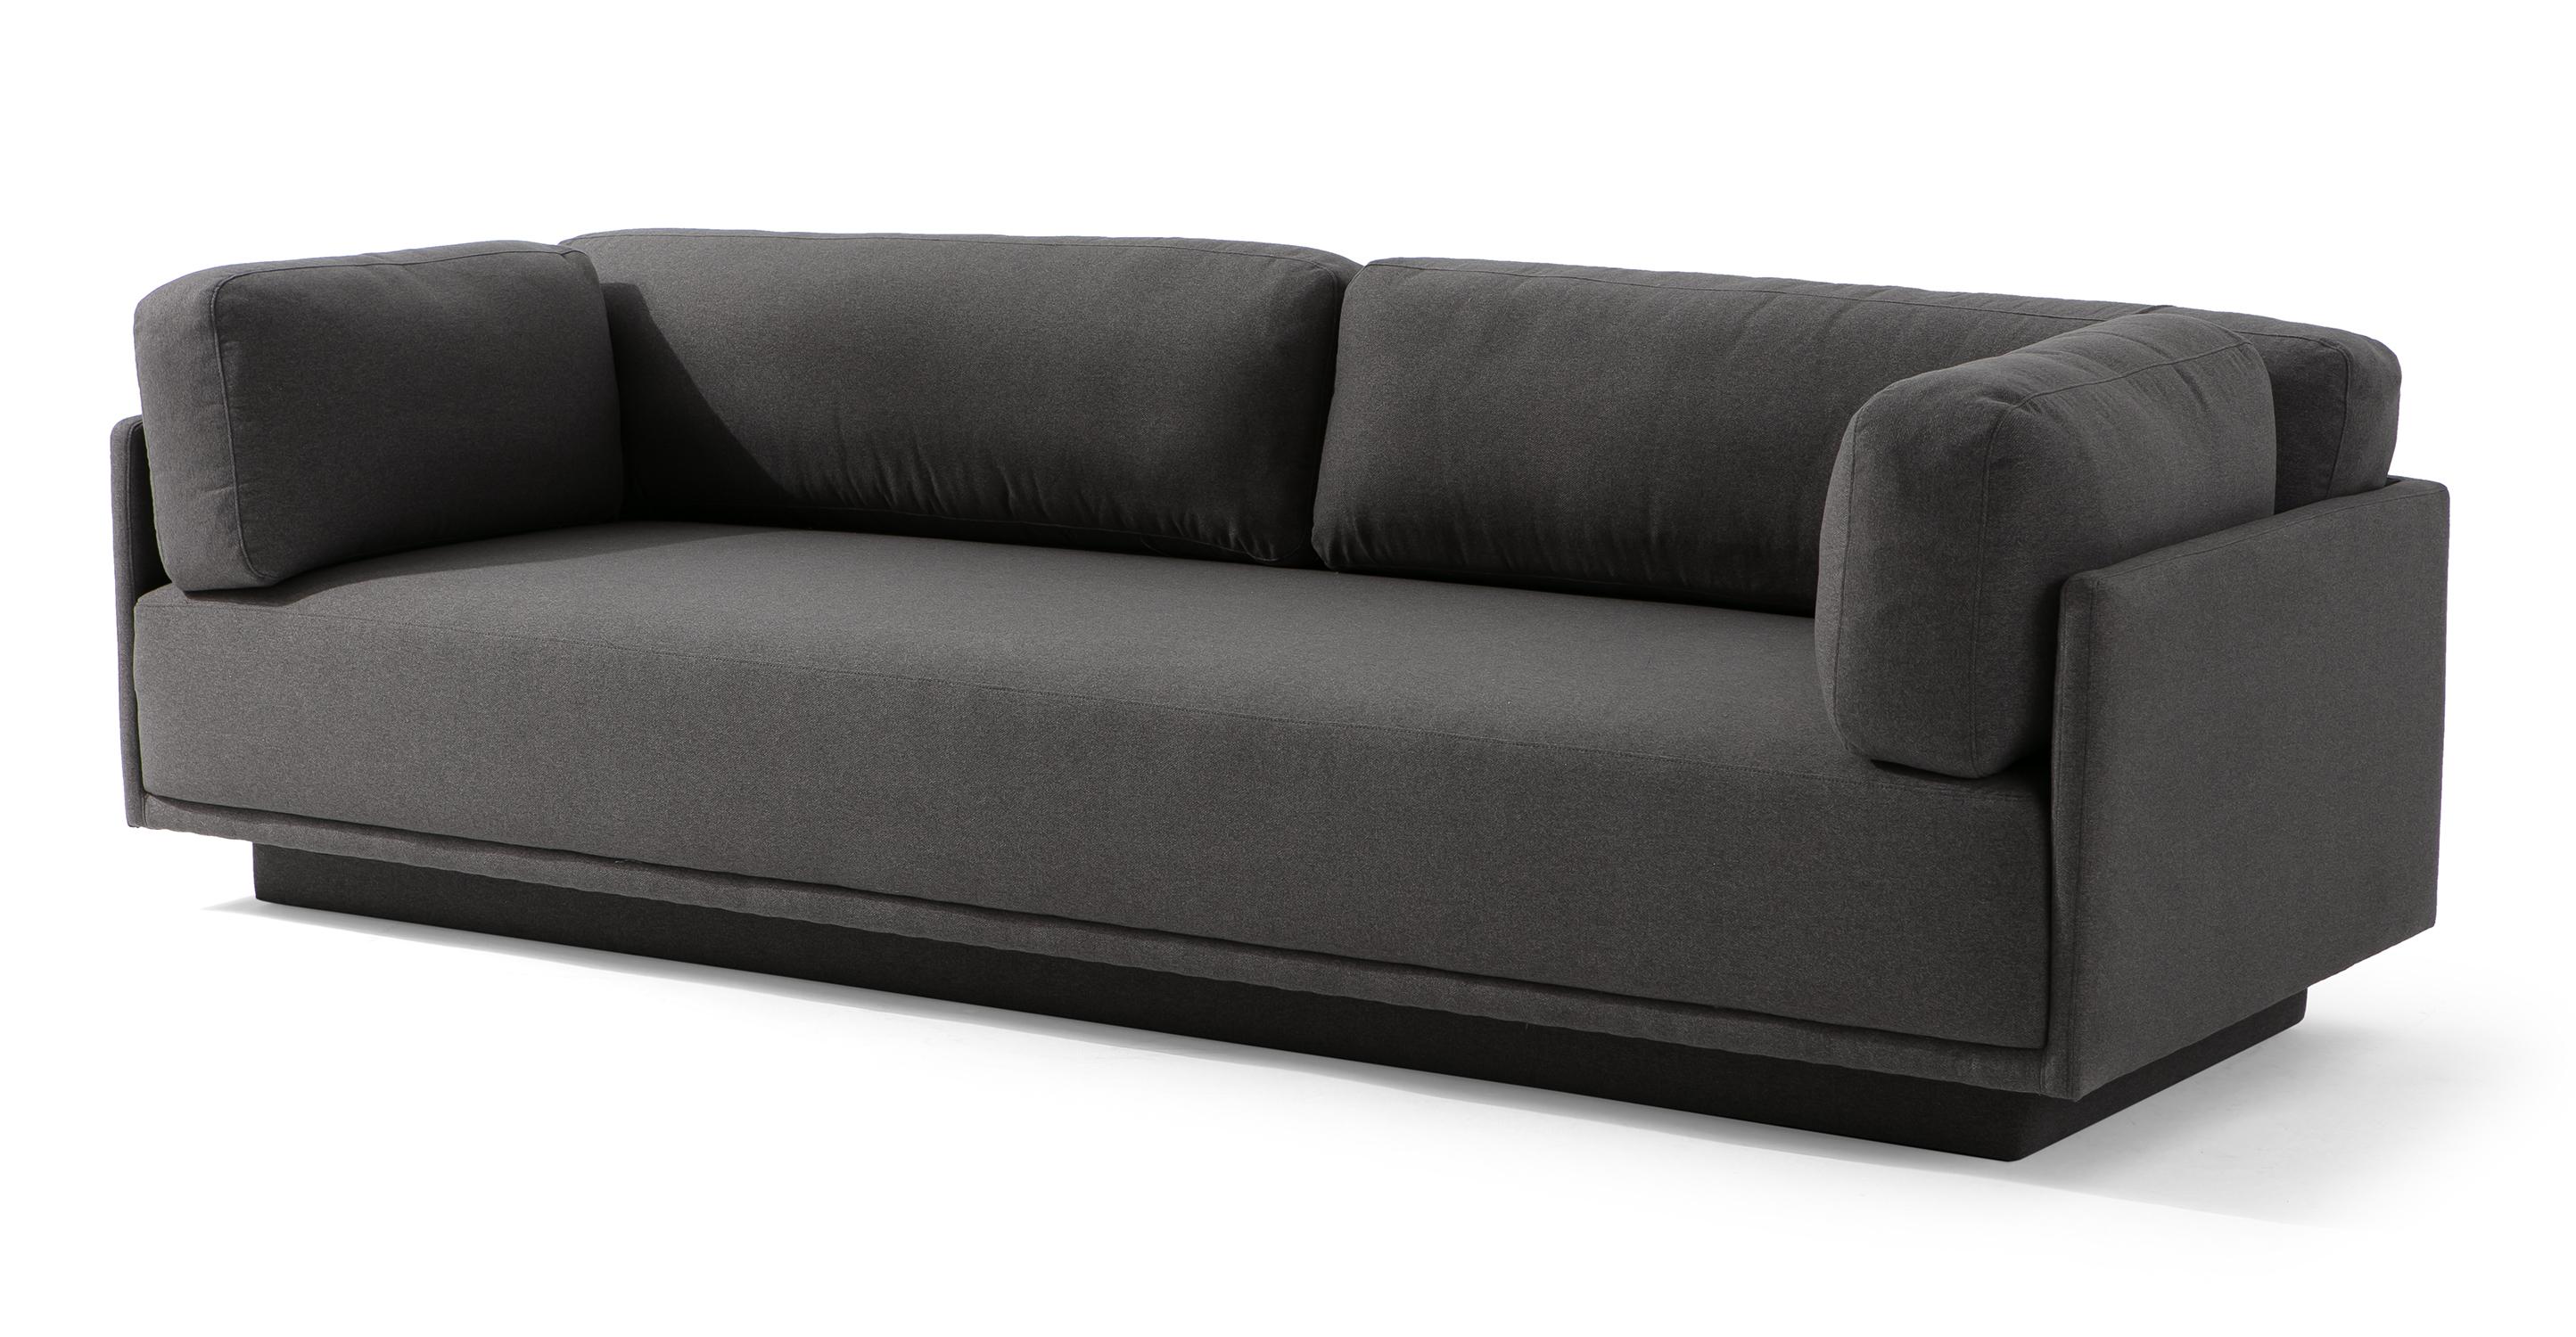 "Cribb XL 102"" Fabric Sofa, Timberwolf"